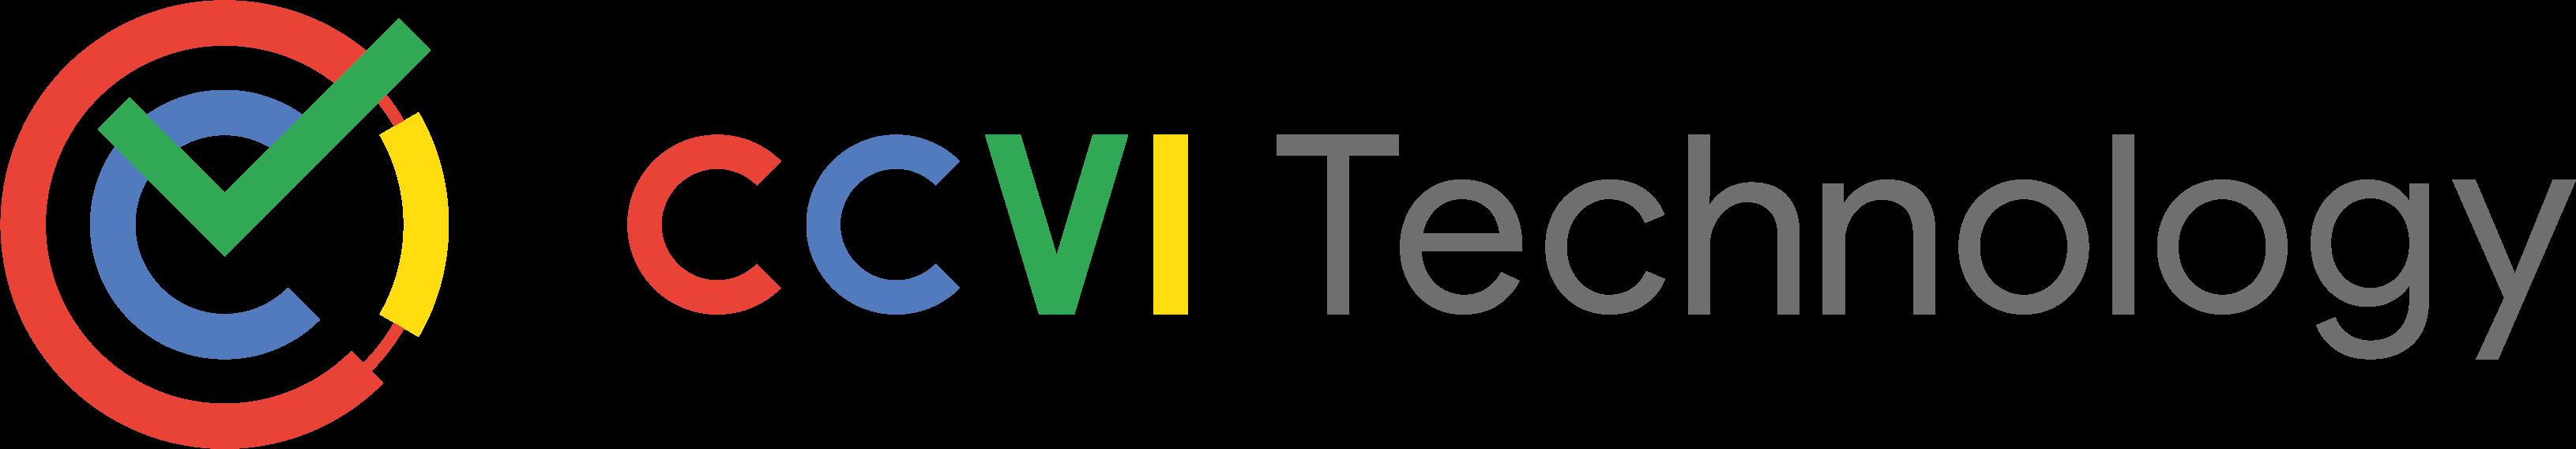 CCVI Technology